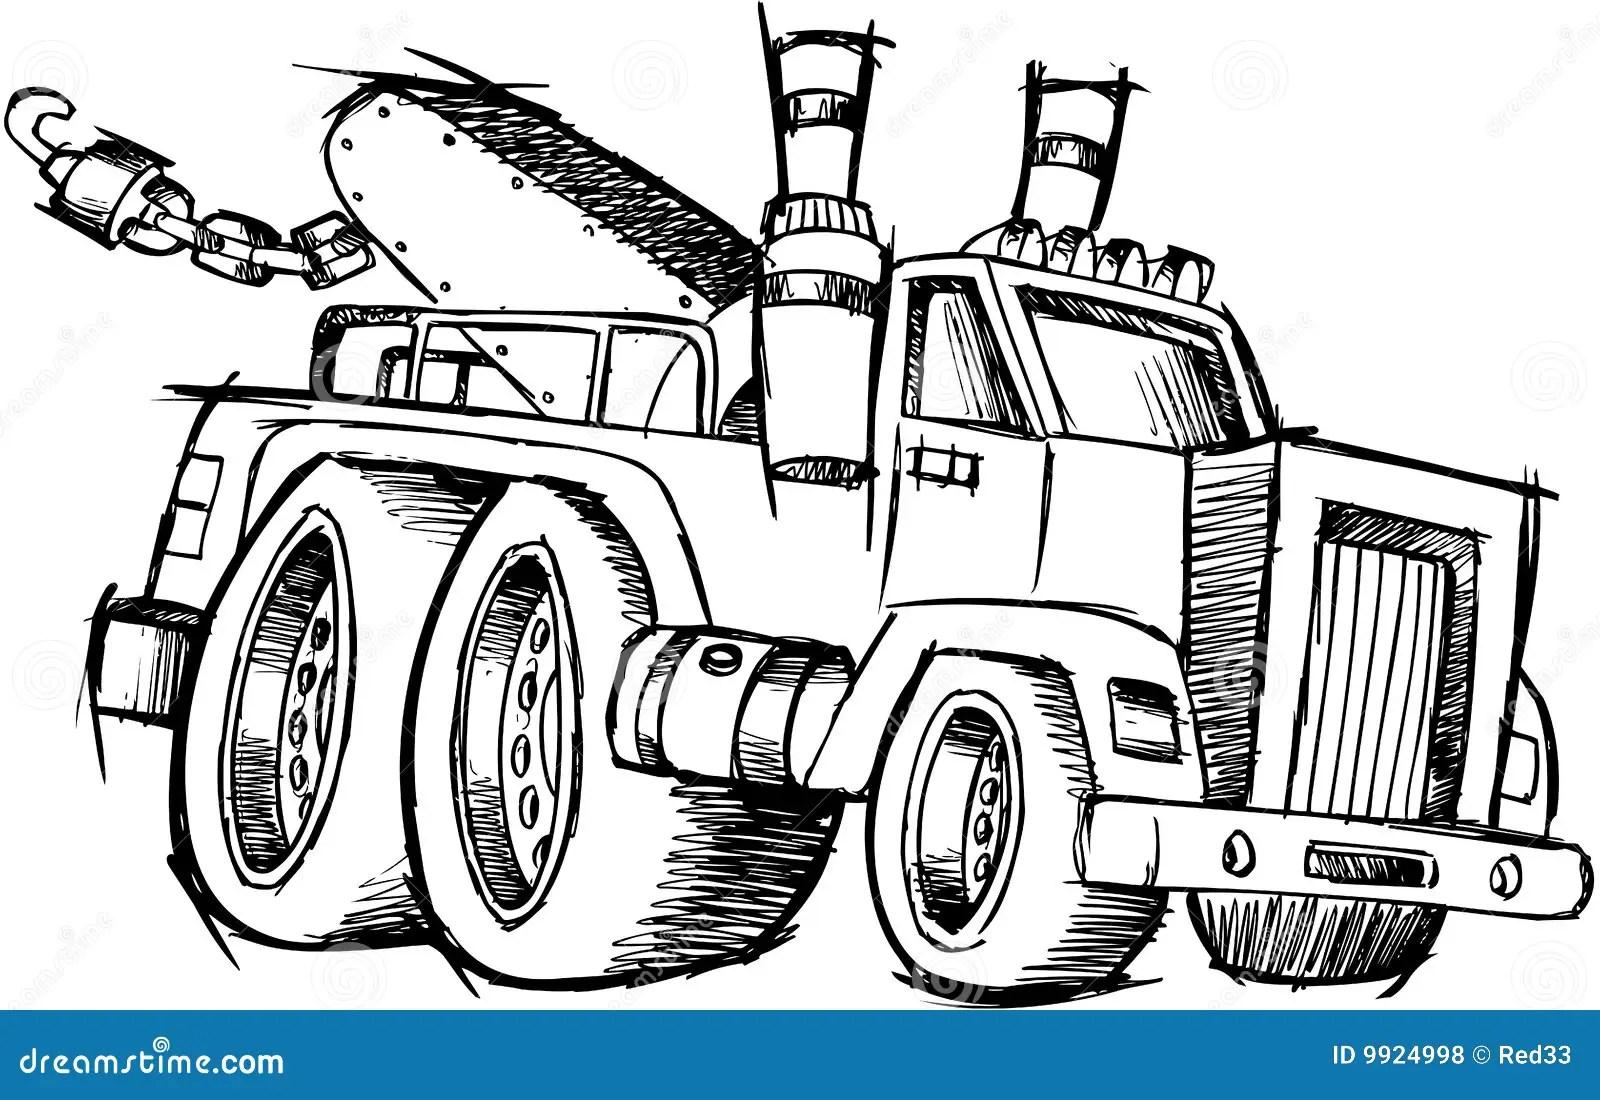 Sketchy Tow Truck Vector Royalty Free Stock Photos